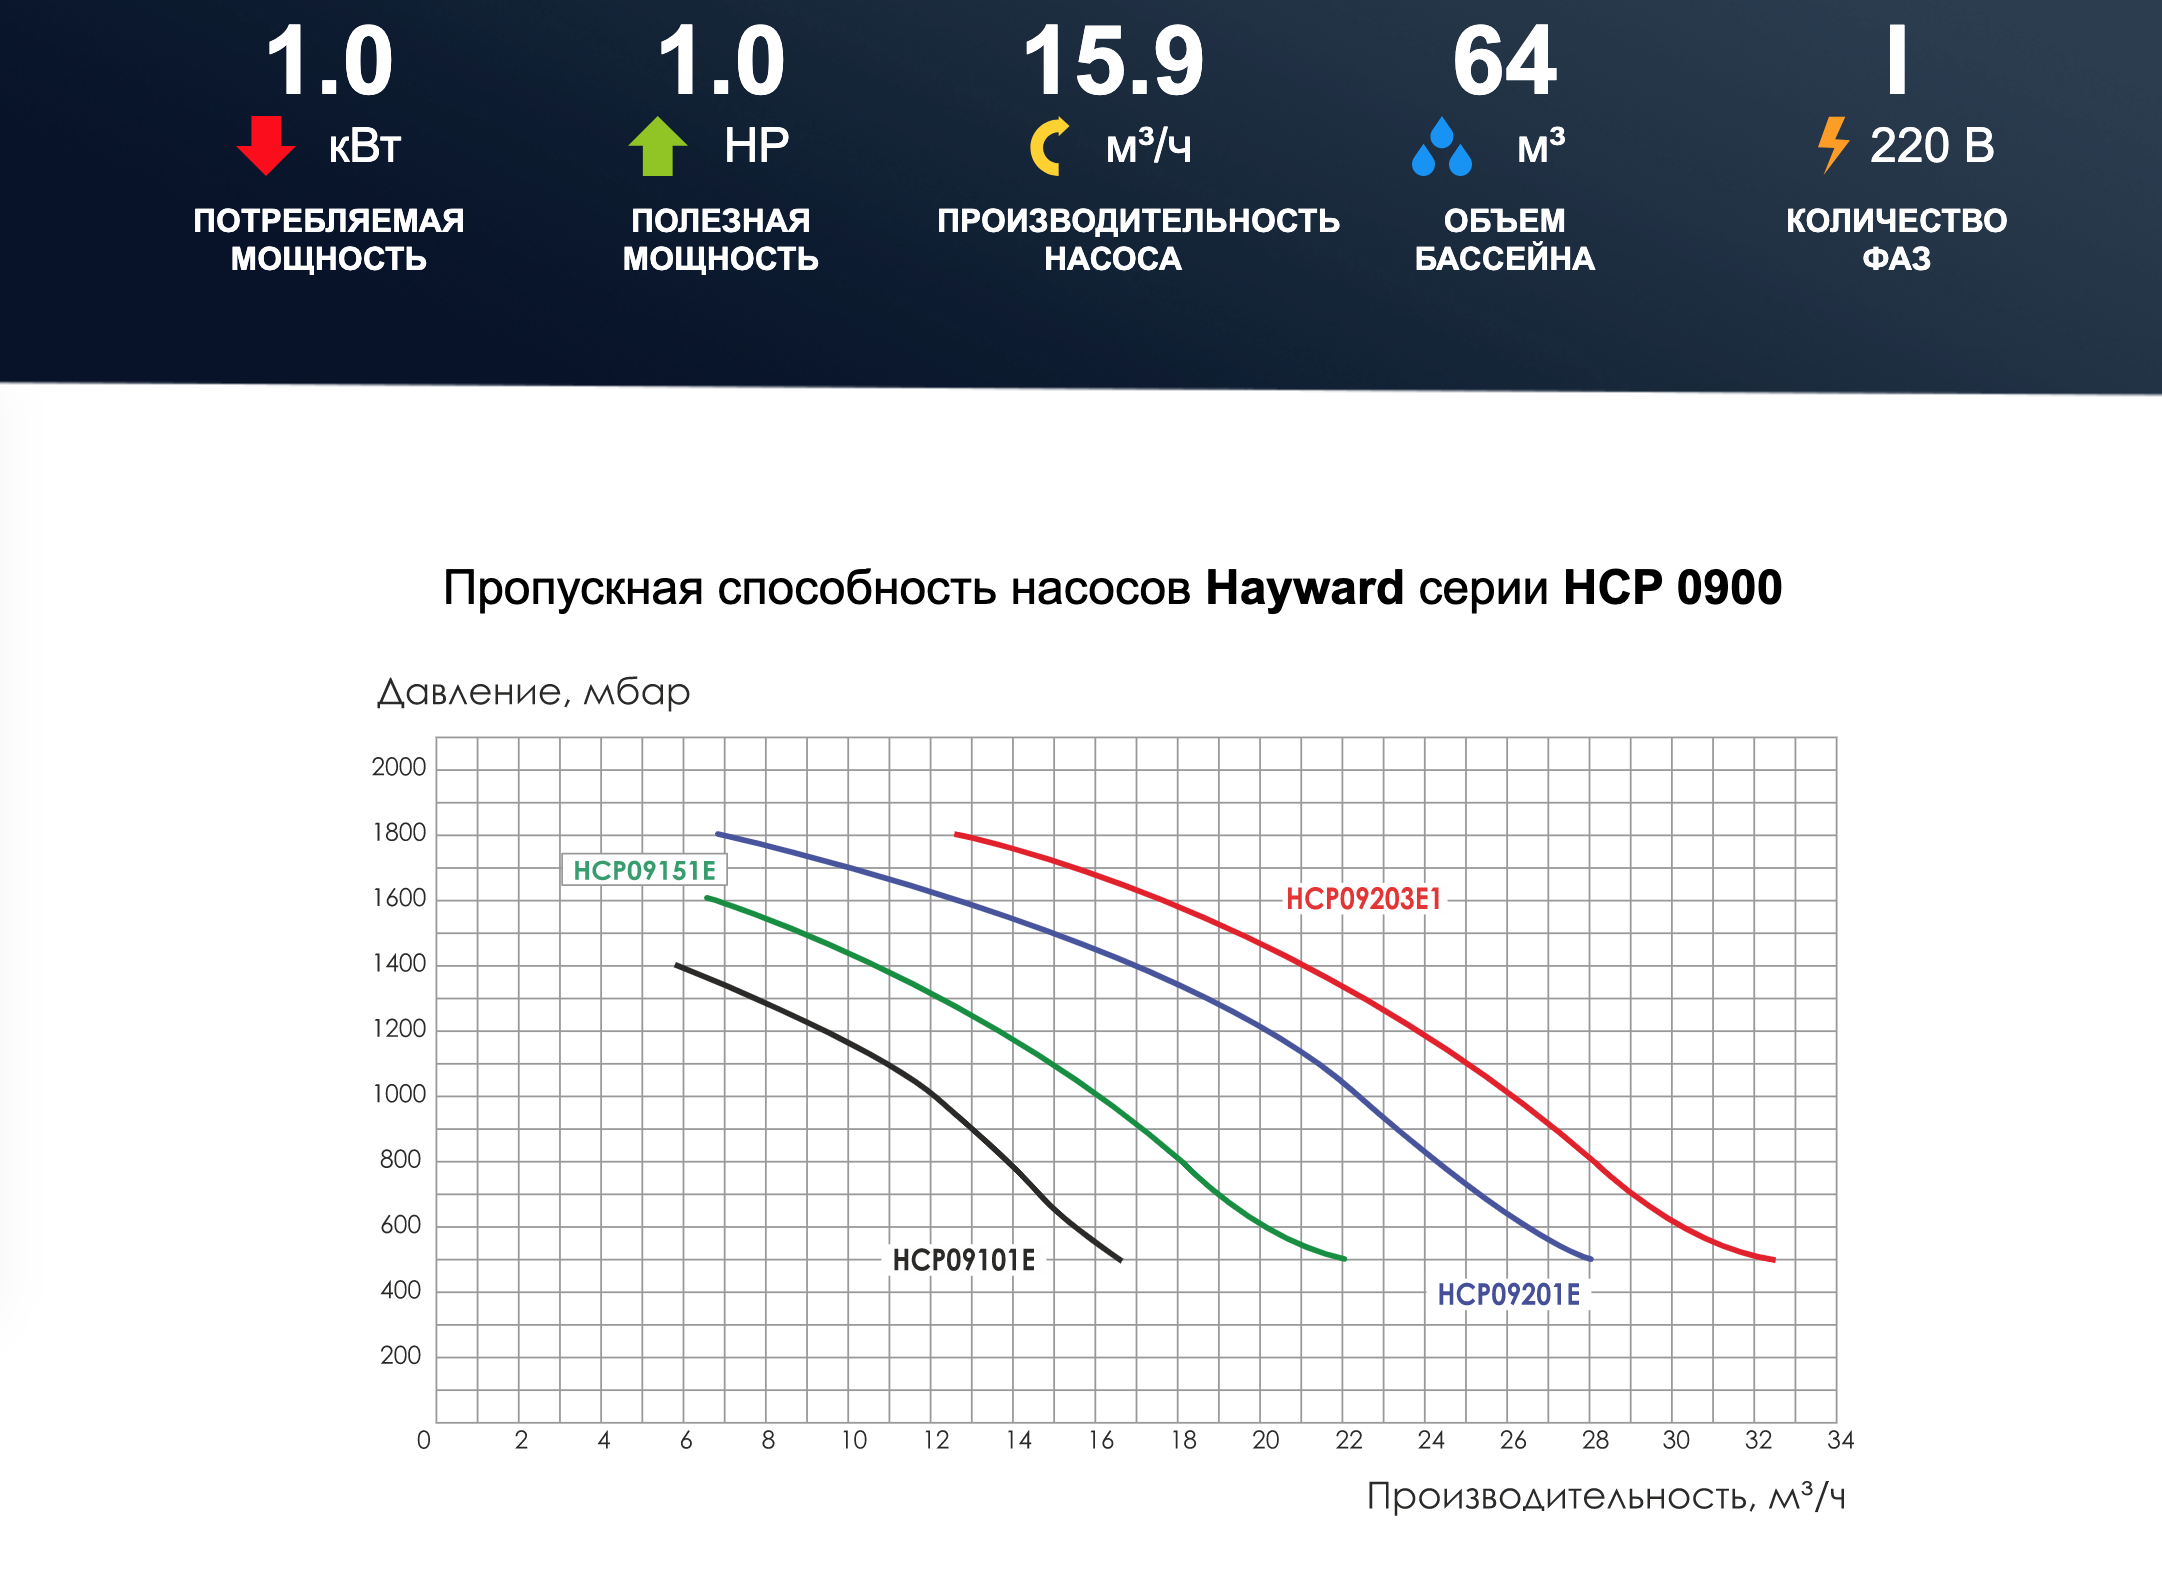 Снимок экрана 2021-03-31 в 20.45.41